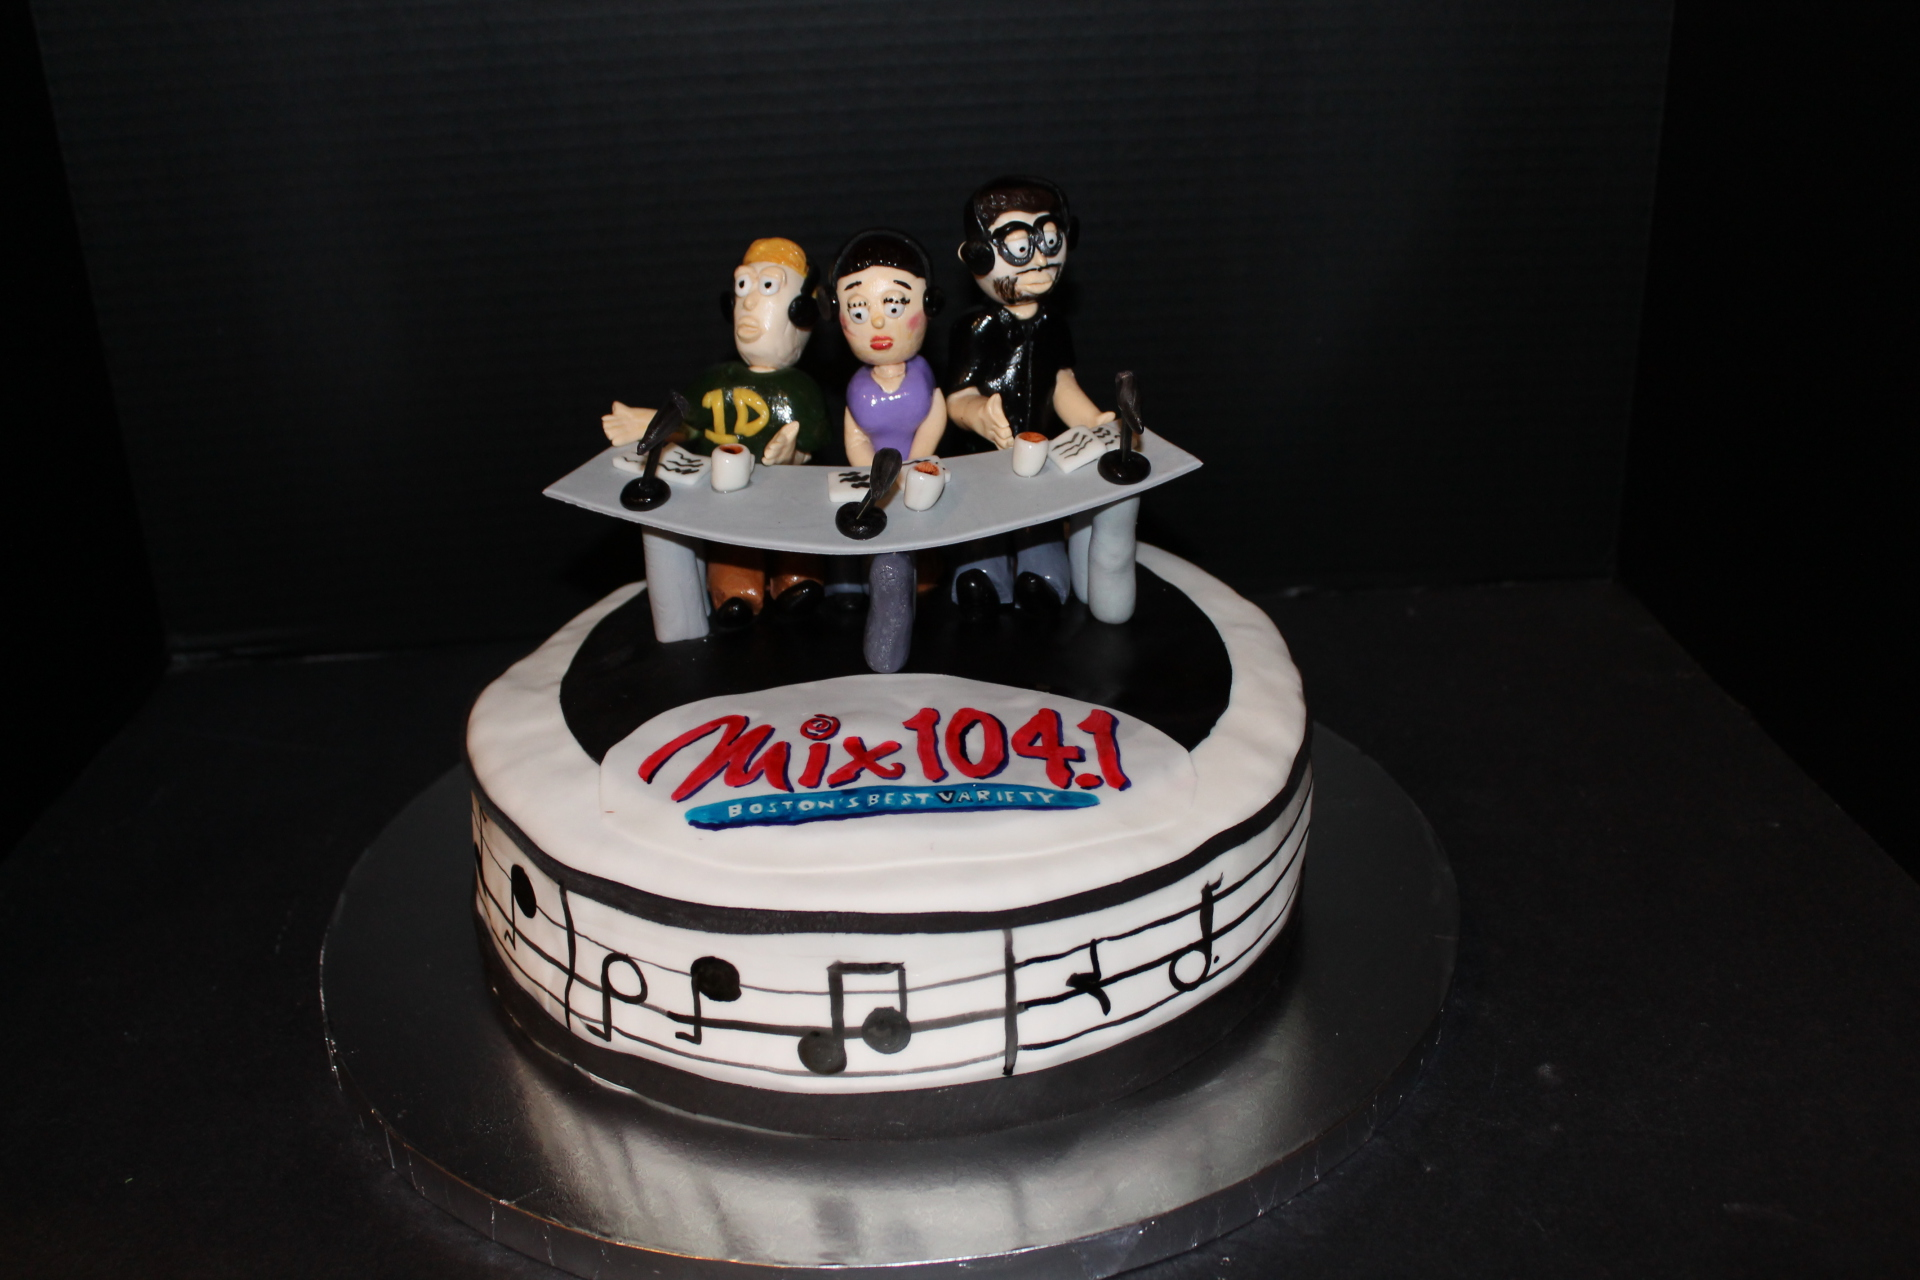 Mix 104.1 Karson & Kennedy cake